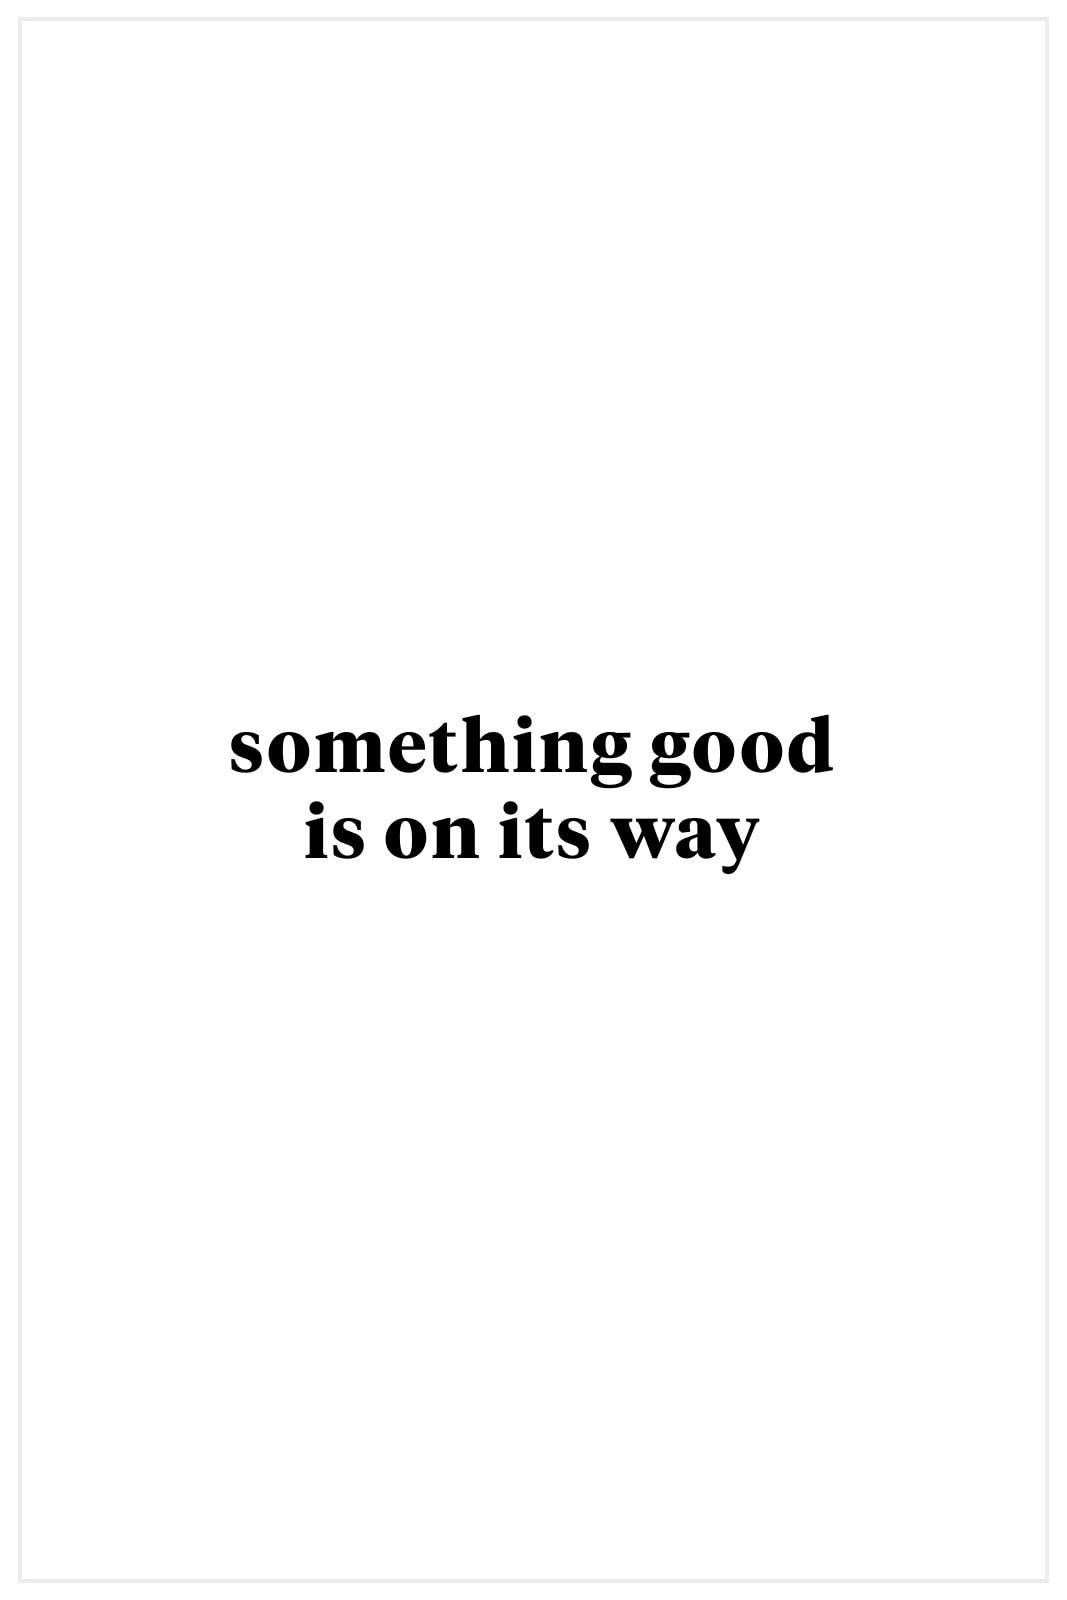 Bandwagon Sunglasses